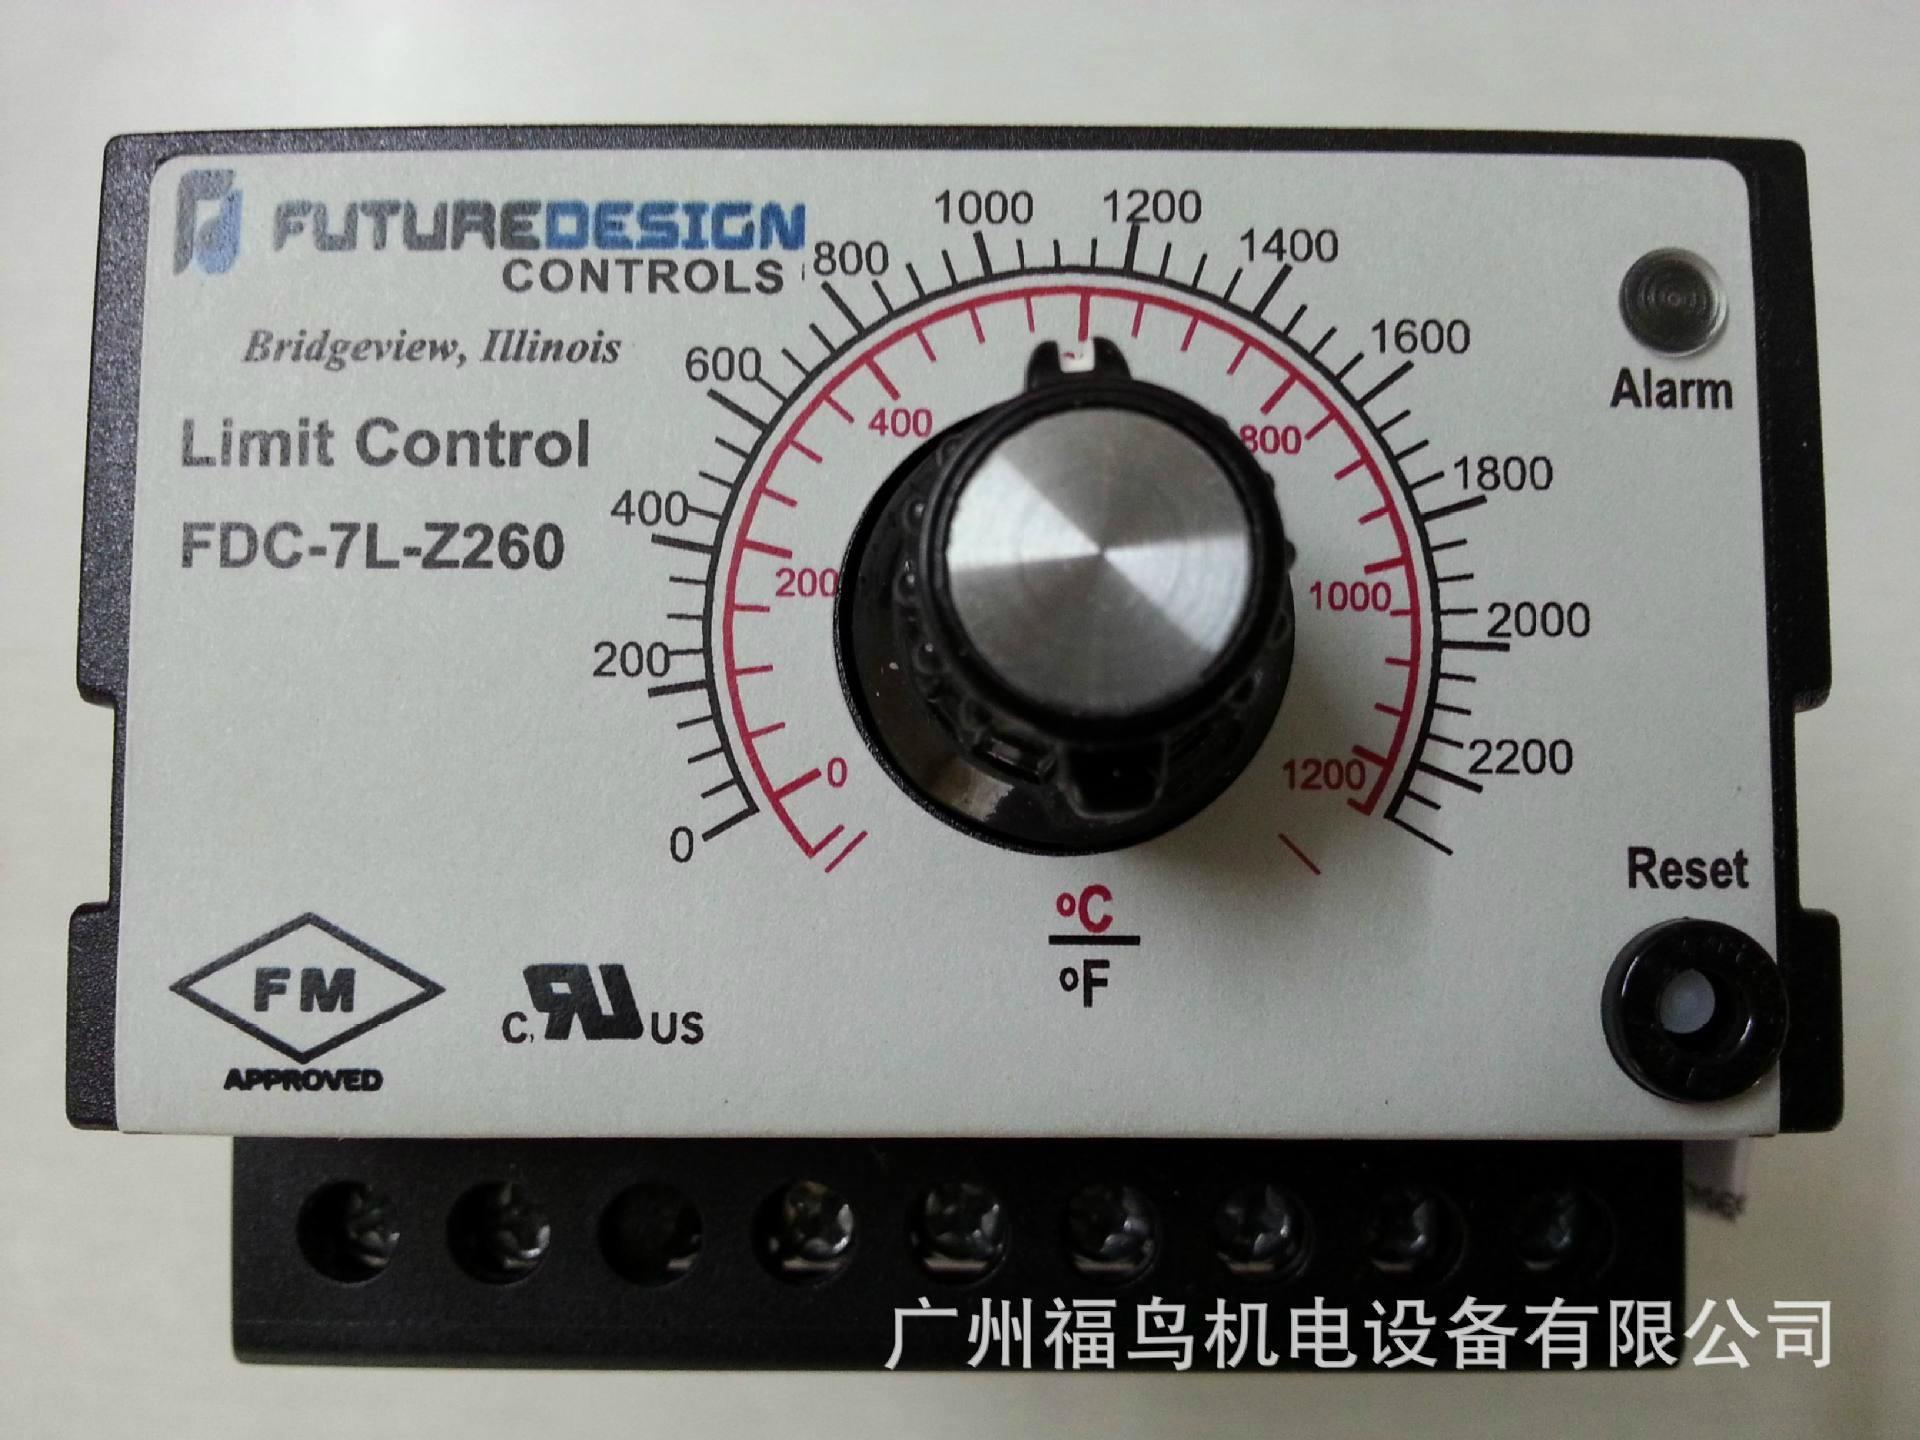 FUTURE DESIGN超溫控制器, 型號: FDC-7L-Z260